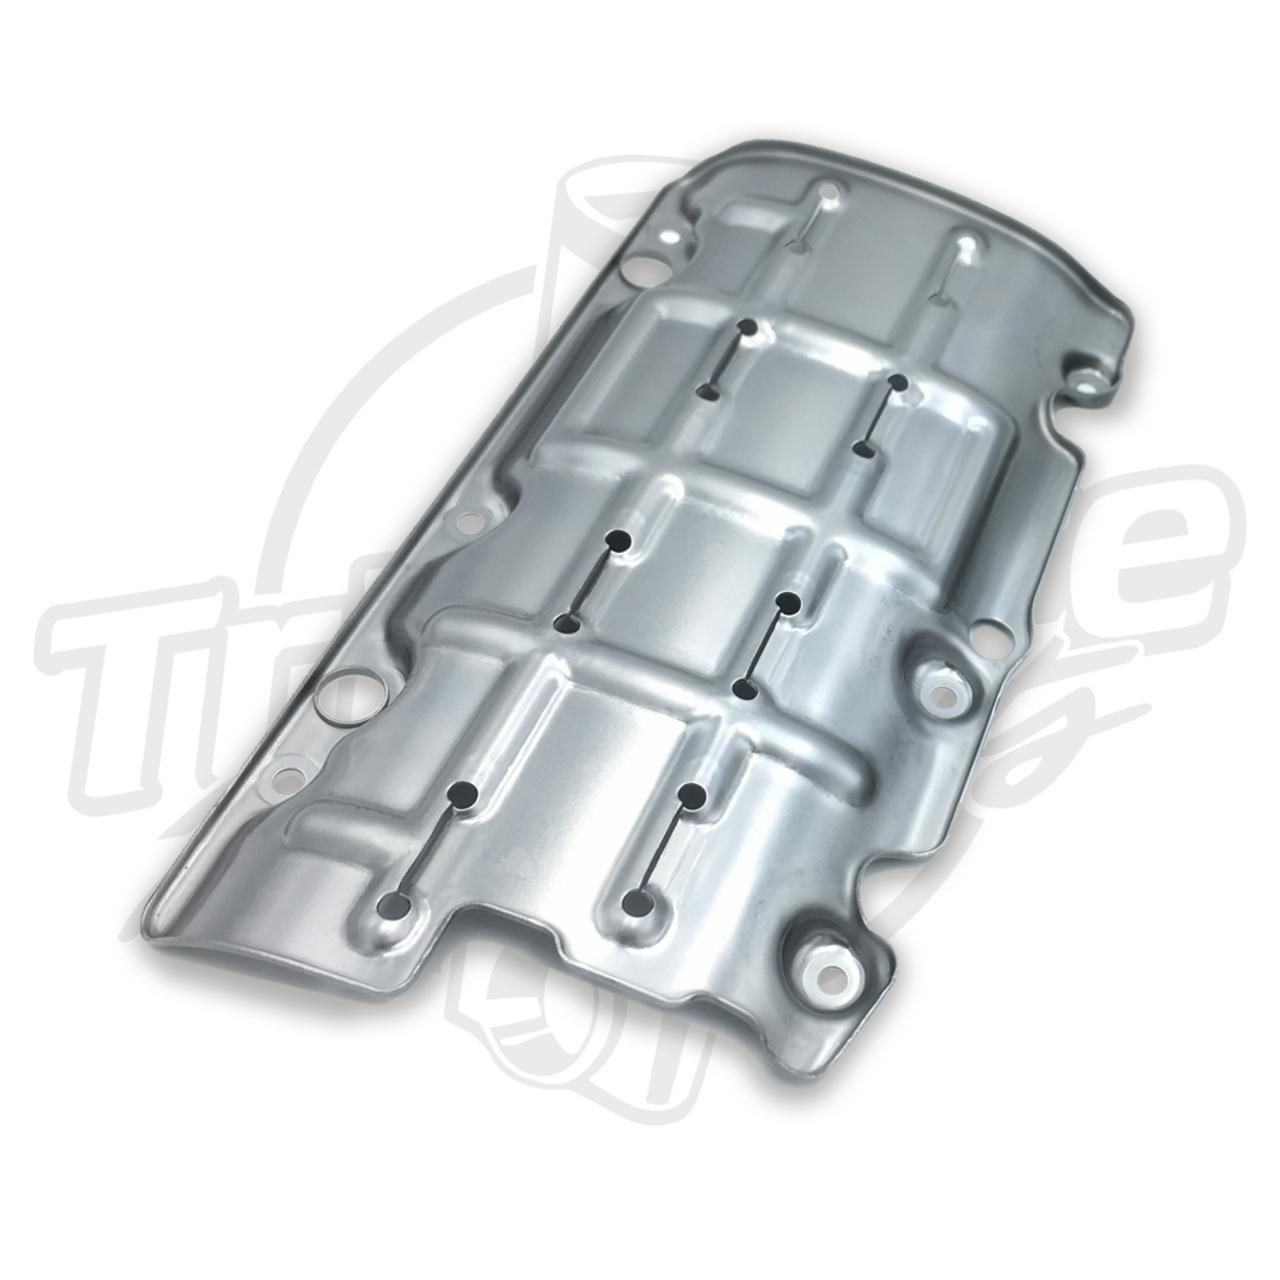 Honda - K20A2 Baffle Plate